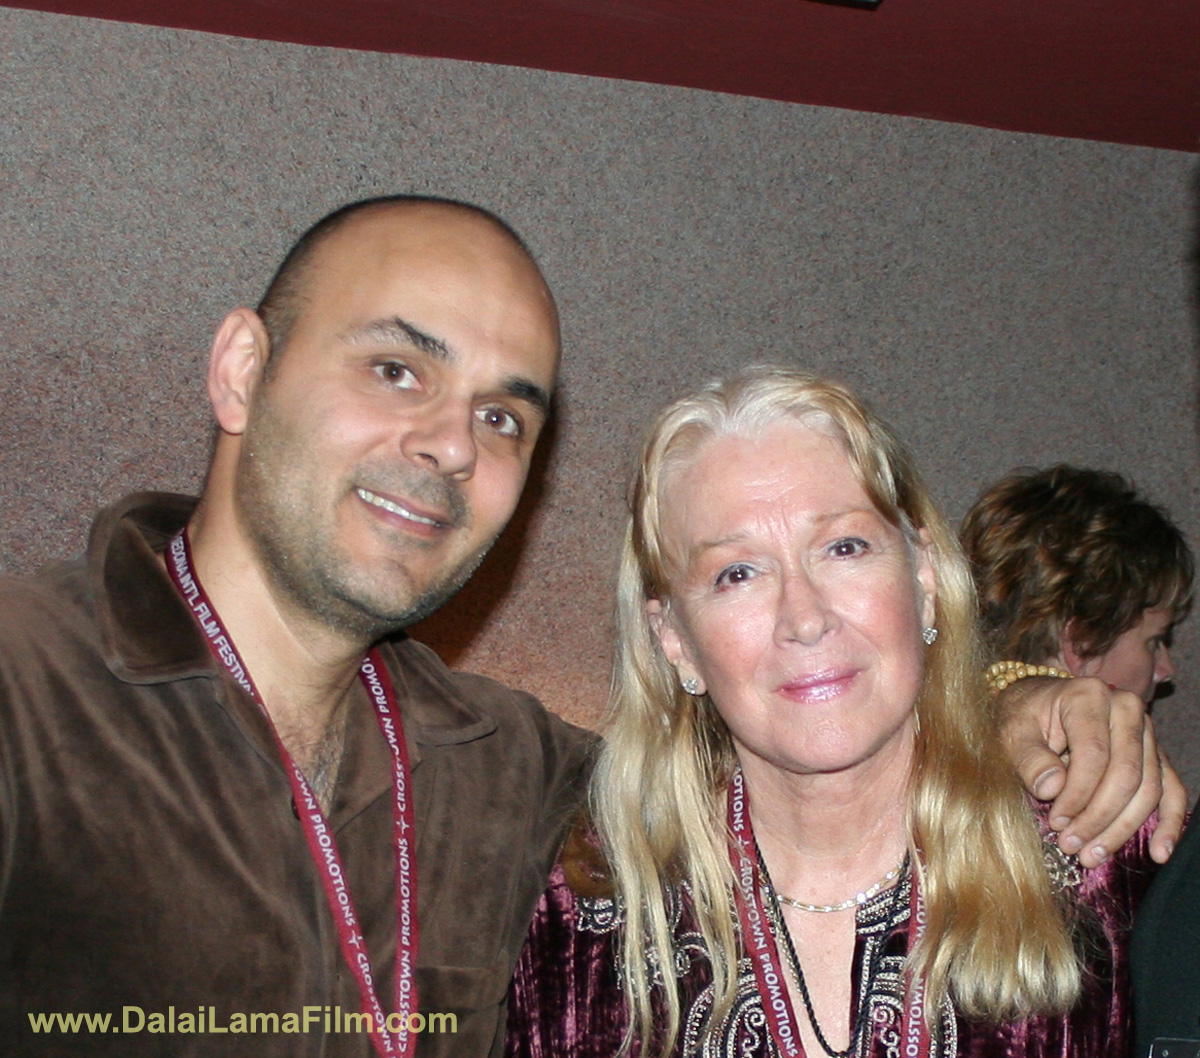 Oscar-nominated actress Diane Ladd and 'Dalai Lama Awakening' Film Director Khashyar Darvich